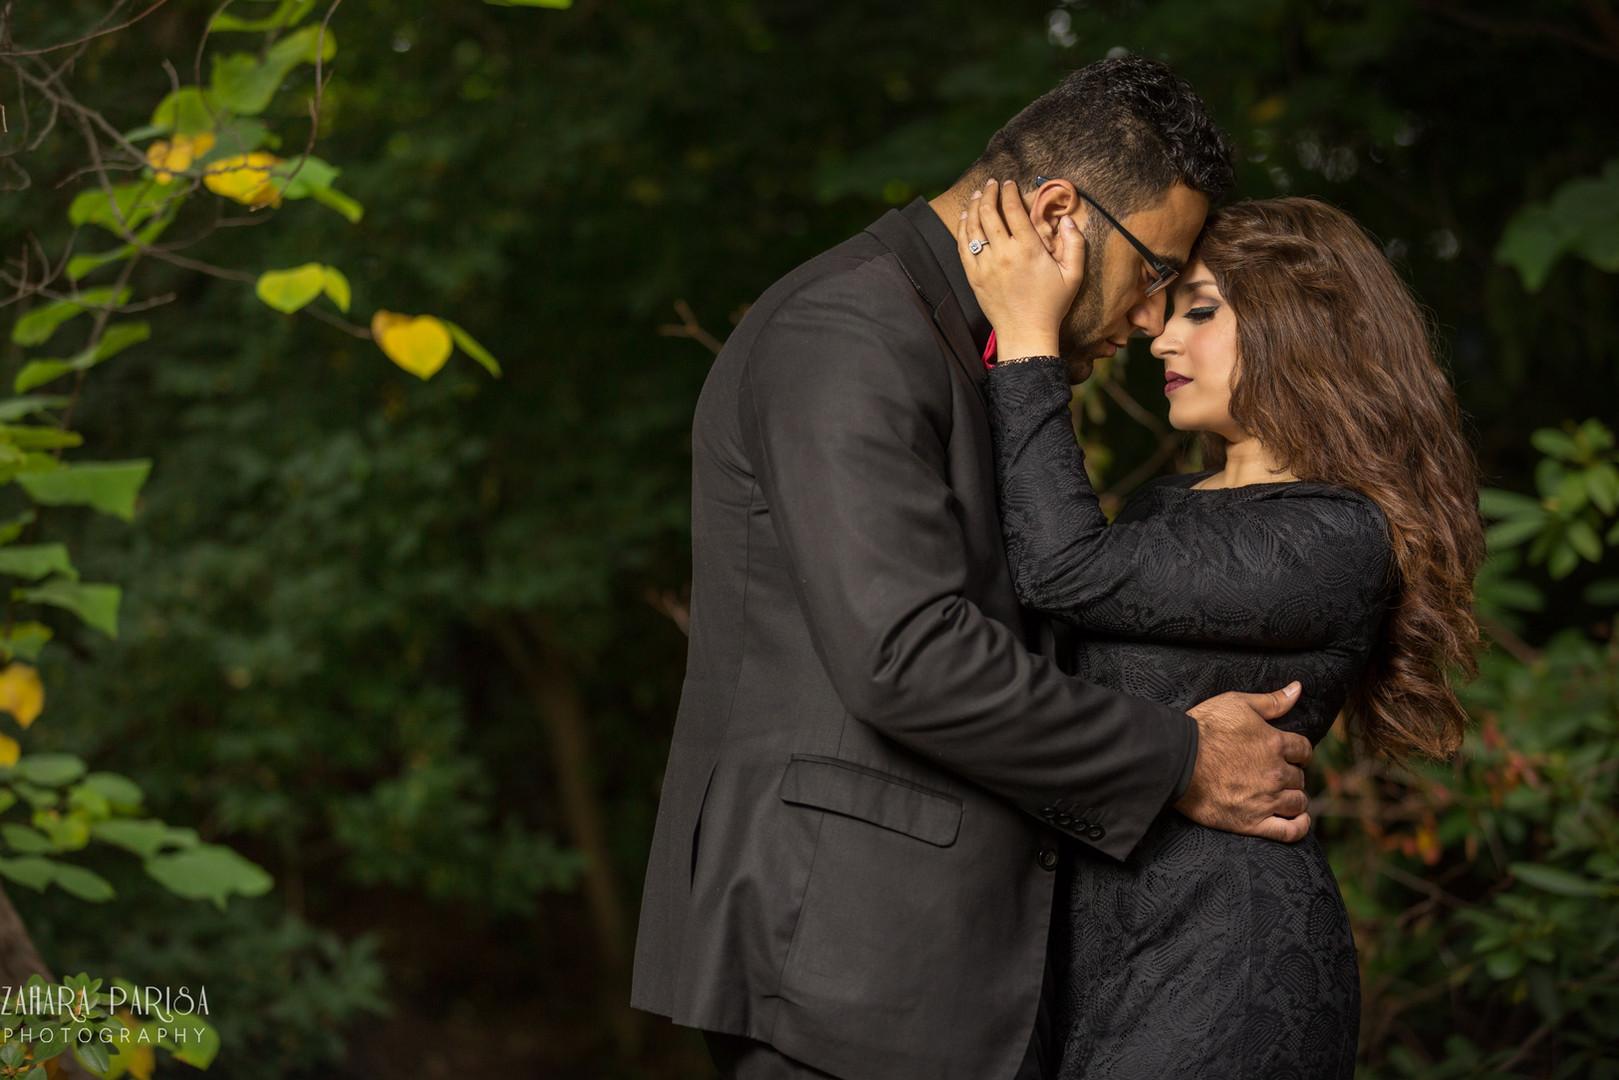 Alexandra Muir Garden, Fall Shoot, Eshoot, Zahara Parisa Photography, Toronto Photographer, Luxury Wedding Engagement shoot Parks in Toronto Toronto Photographer Pakistani Wedding